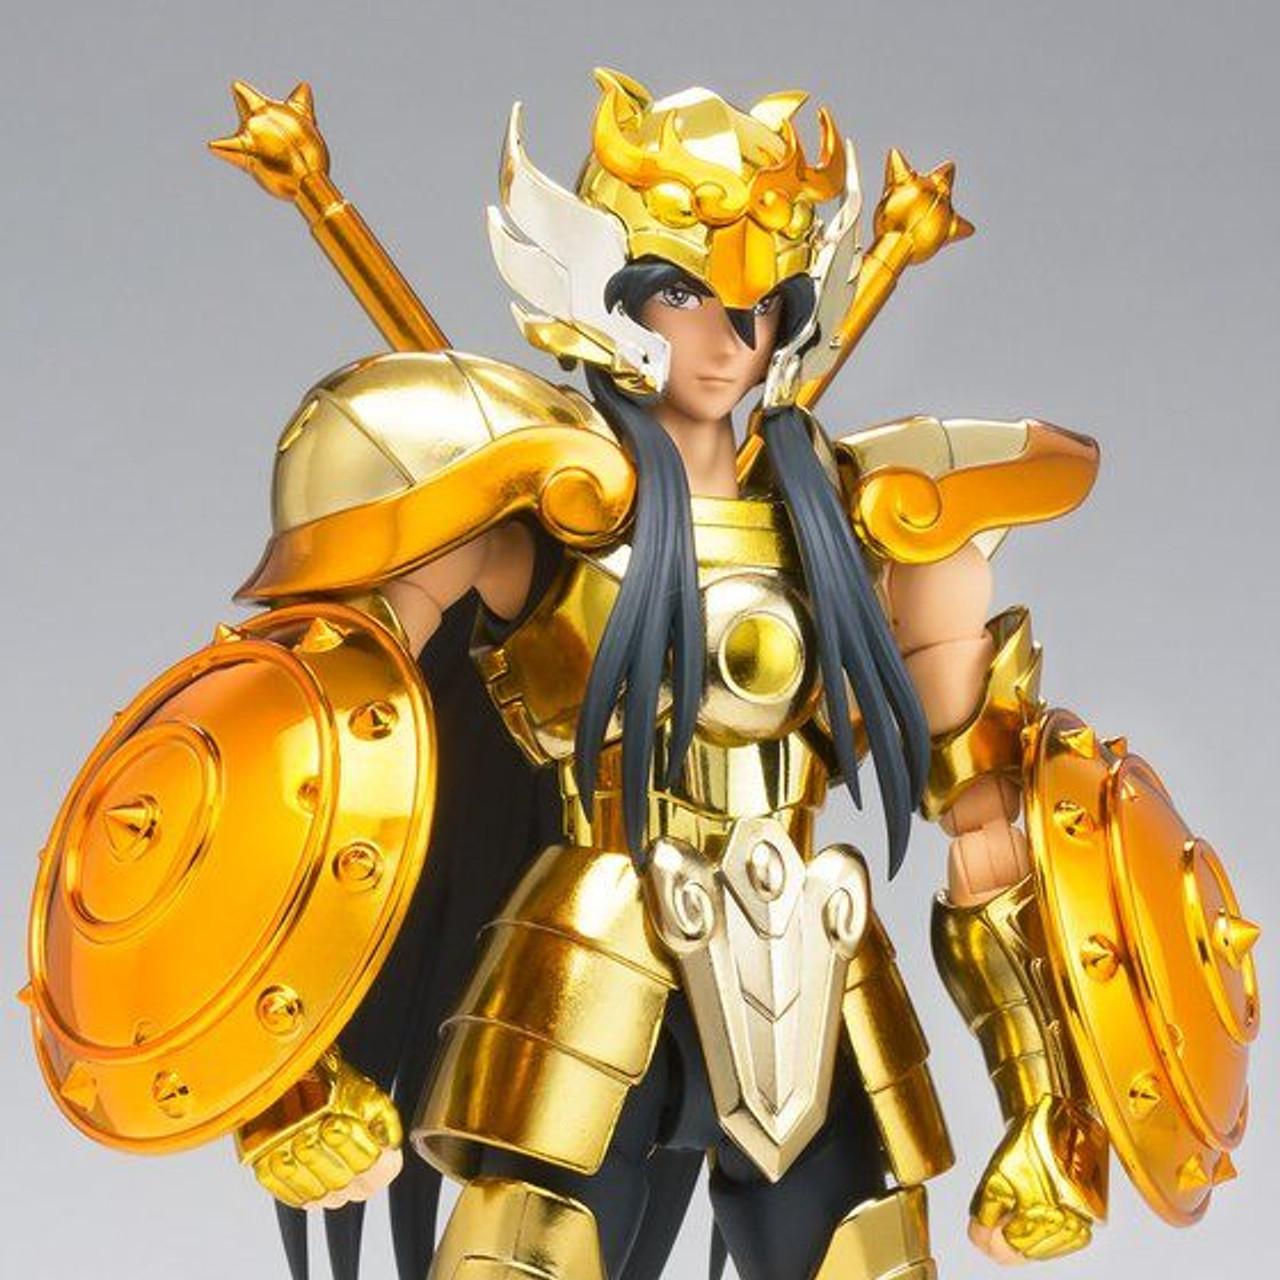 BANDAI Premium Saint Seiya Cloth Myth EX Aquarius Hyoga Action Figure